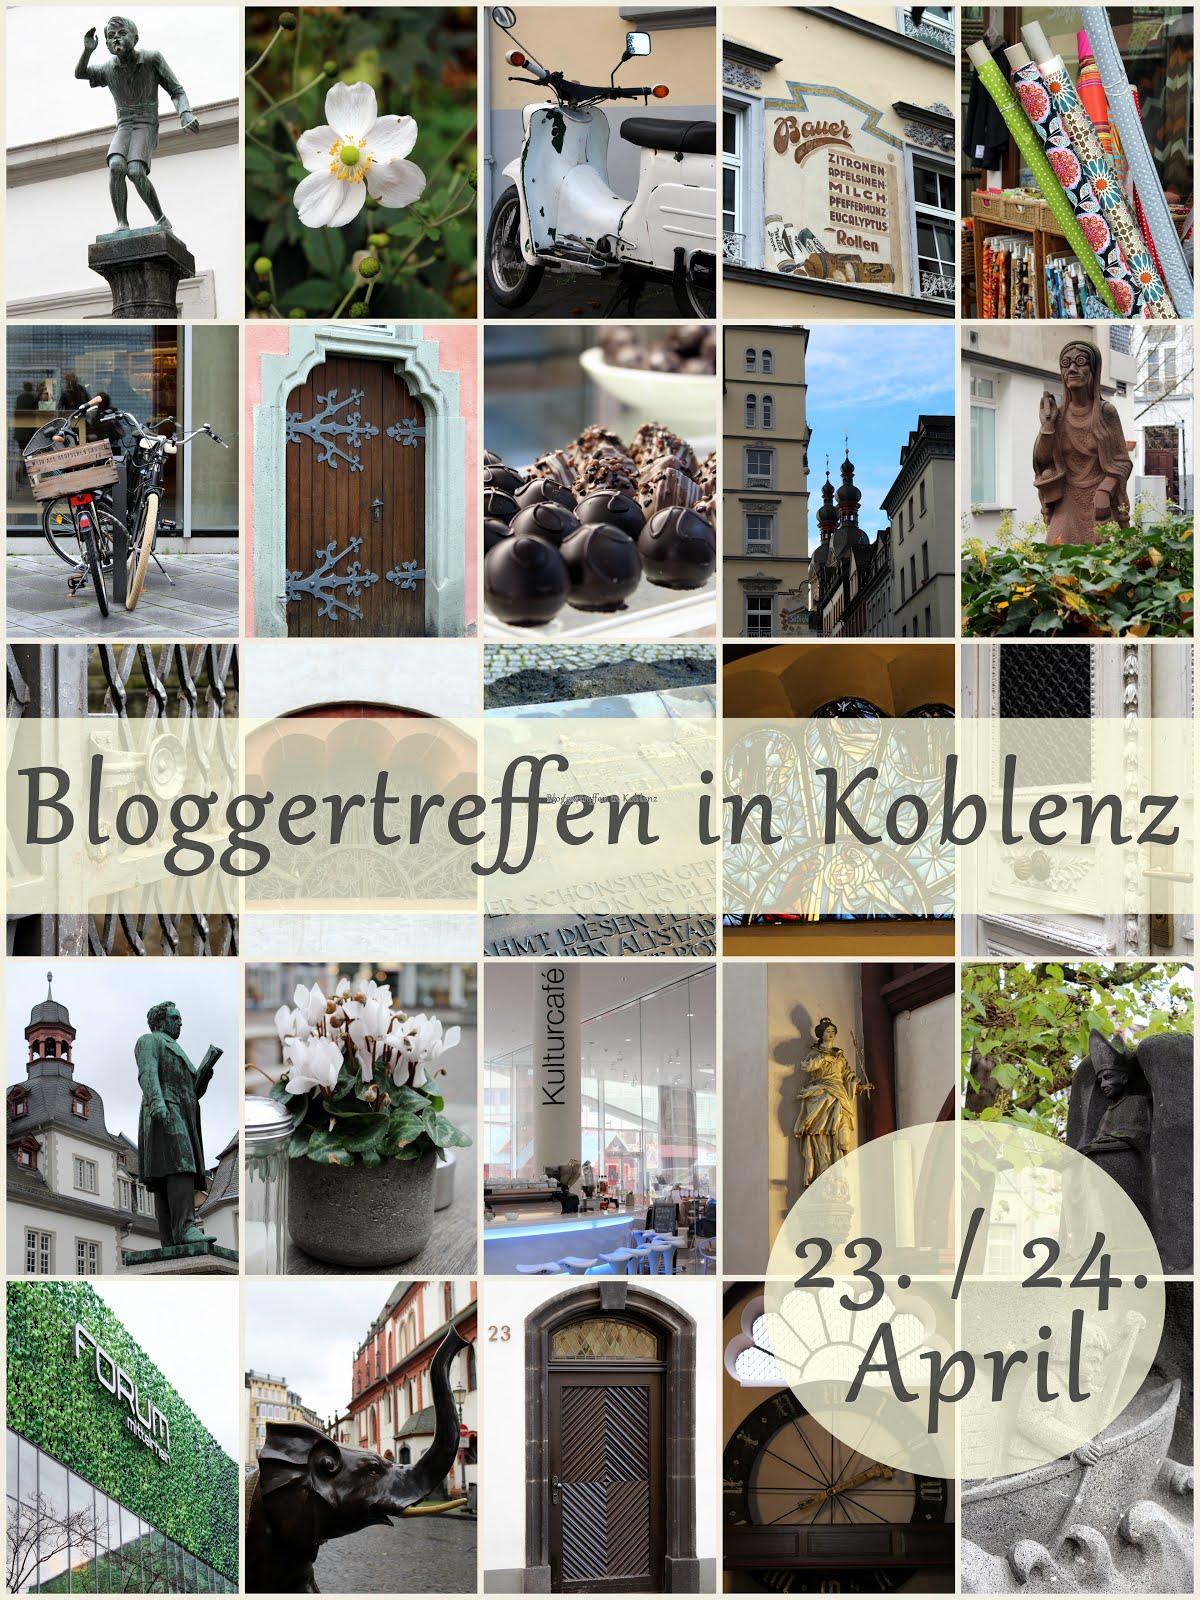 Bloggertreff Koblenz